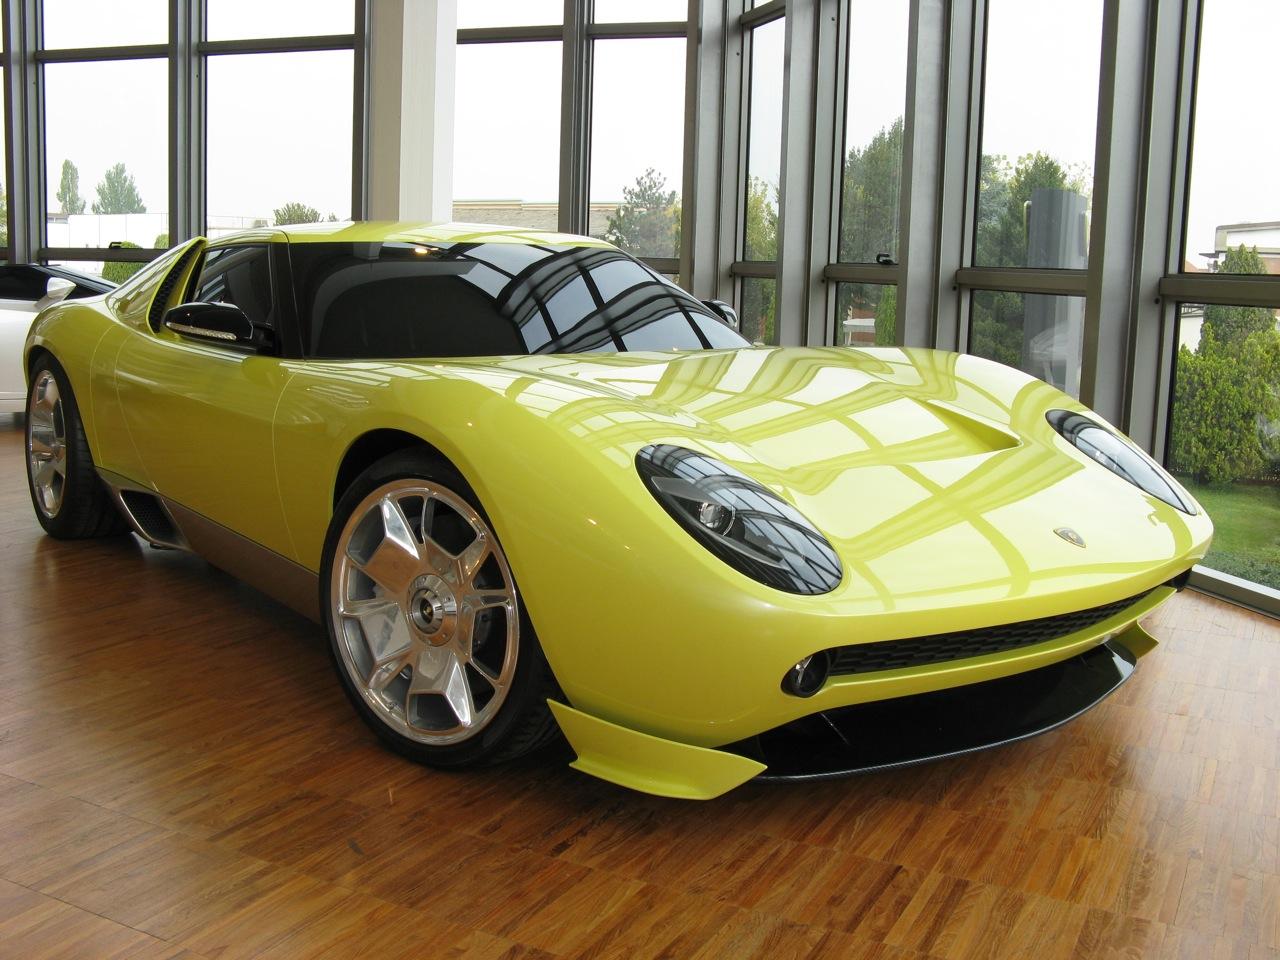 The 2006 Lamborghini Muira concept car.